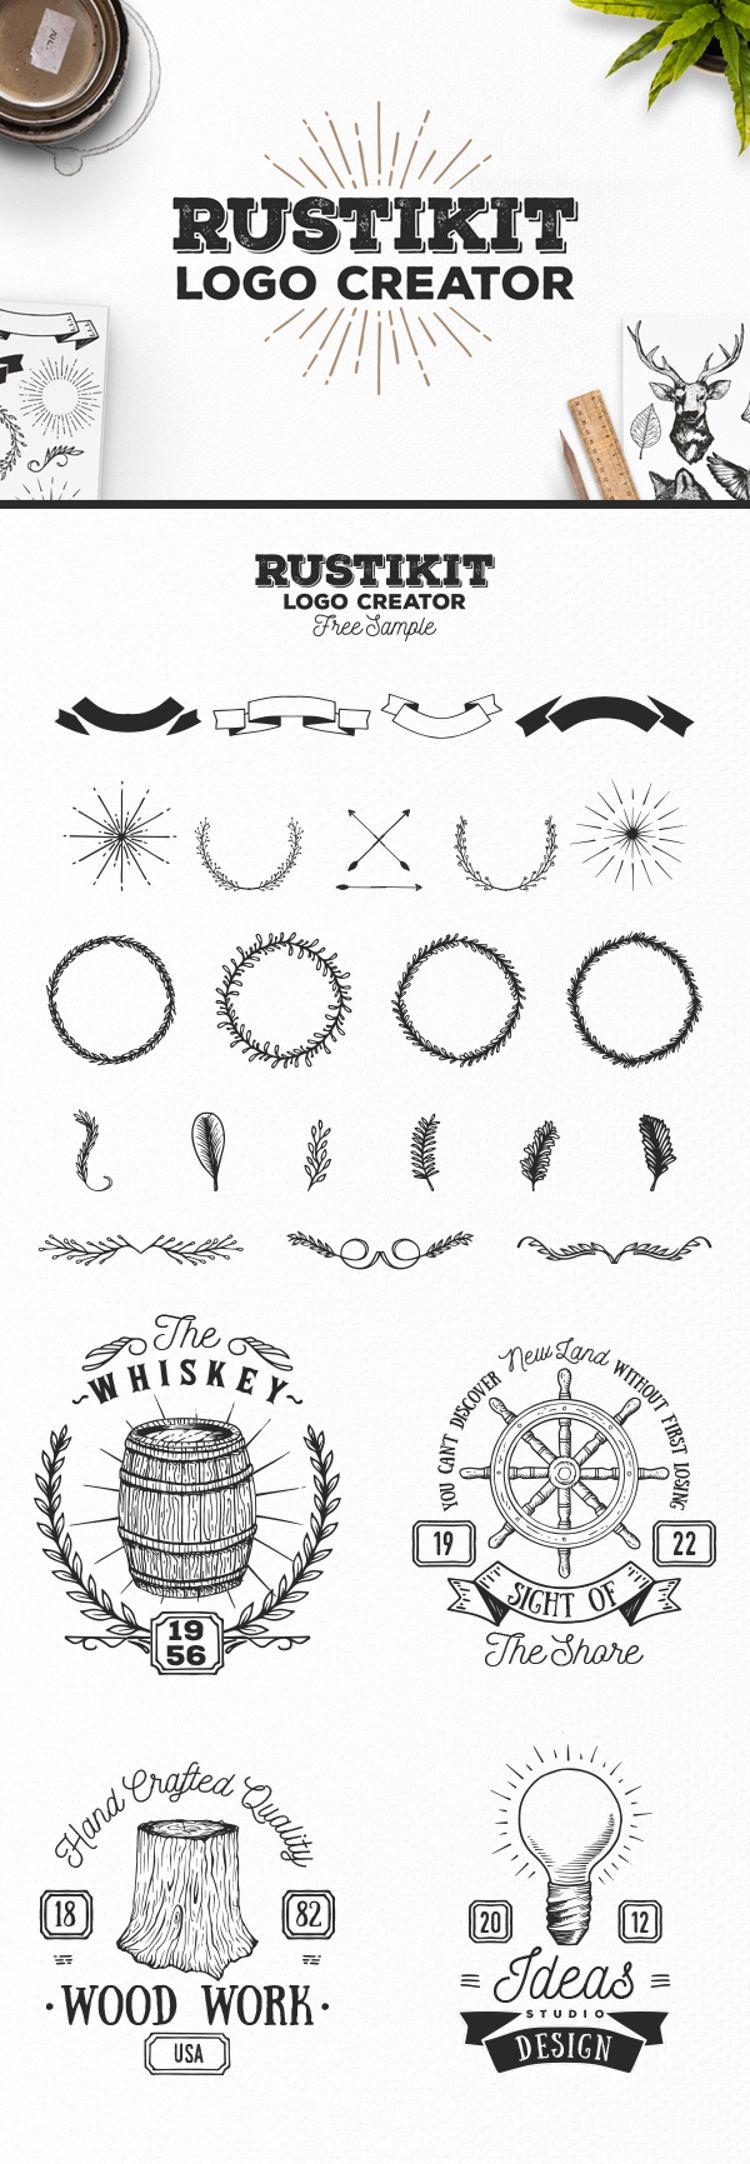 Rustikit Logo Creator - Free Sample